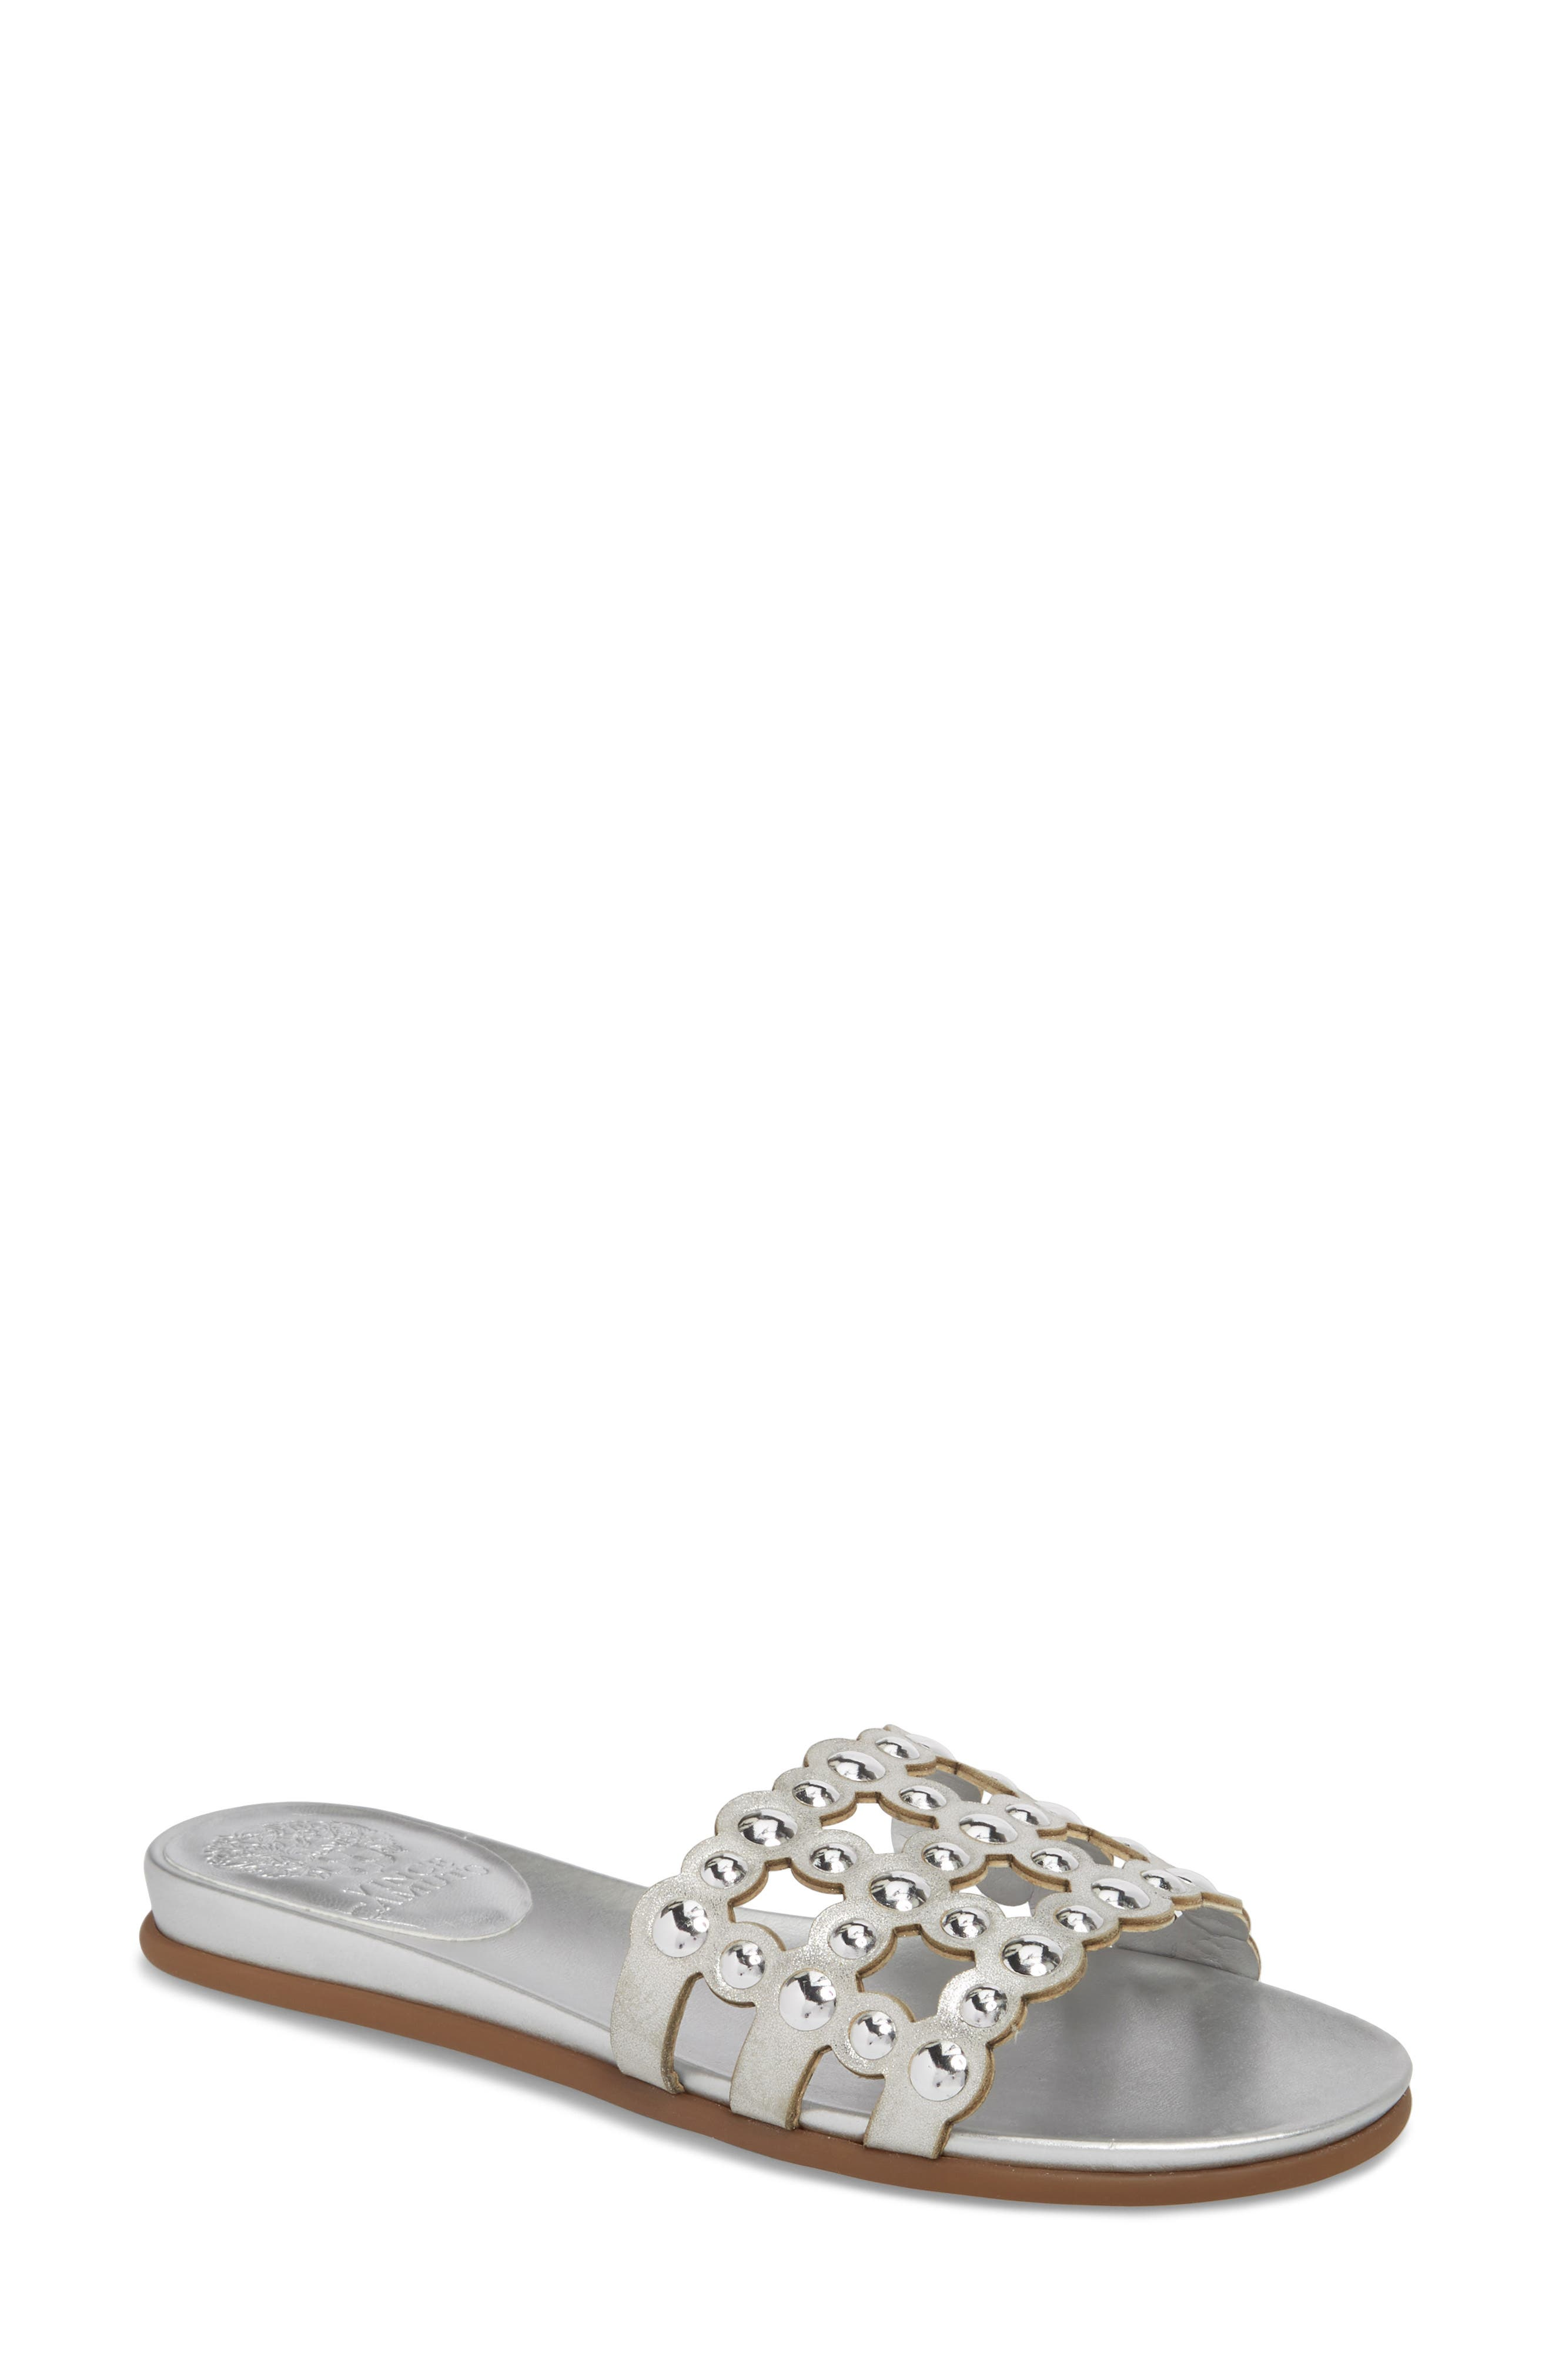 Ellanna Studded Slide Sandal,                             Main thumbnail 1, color,                             Gleaming Silver Leather